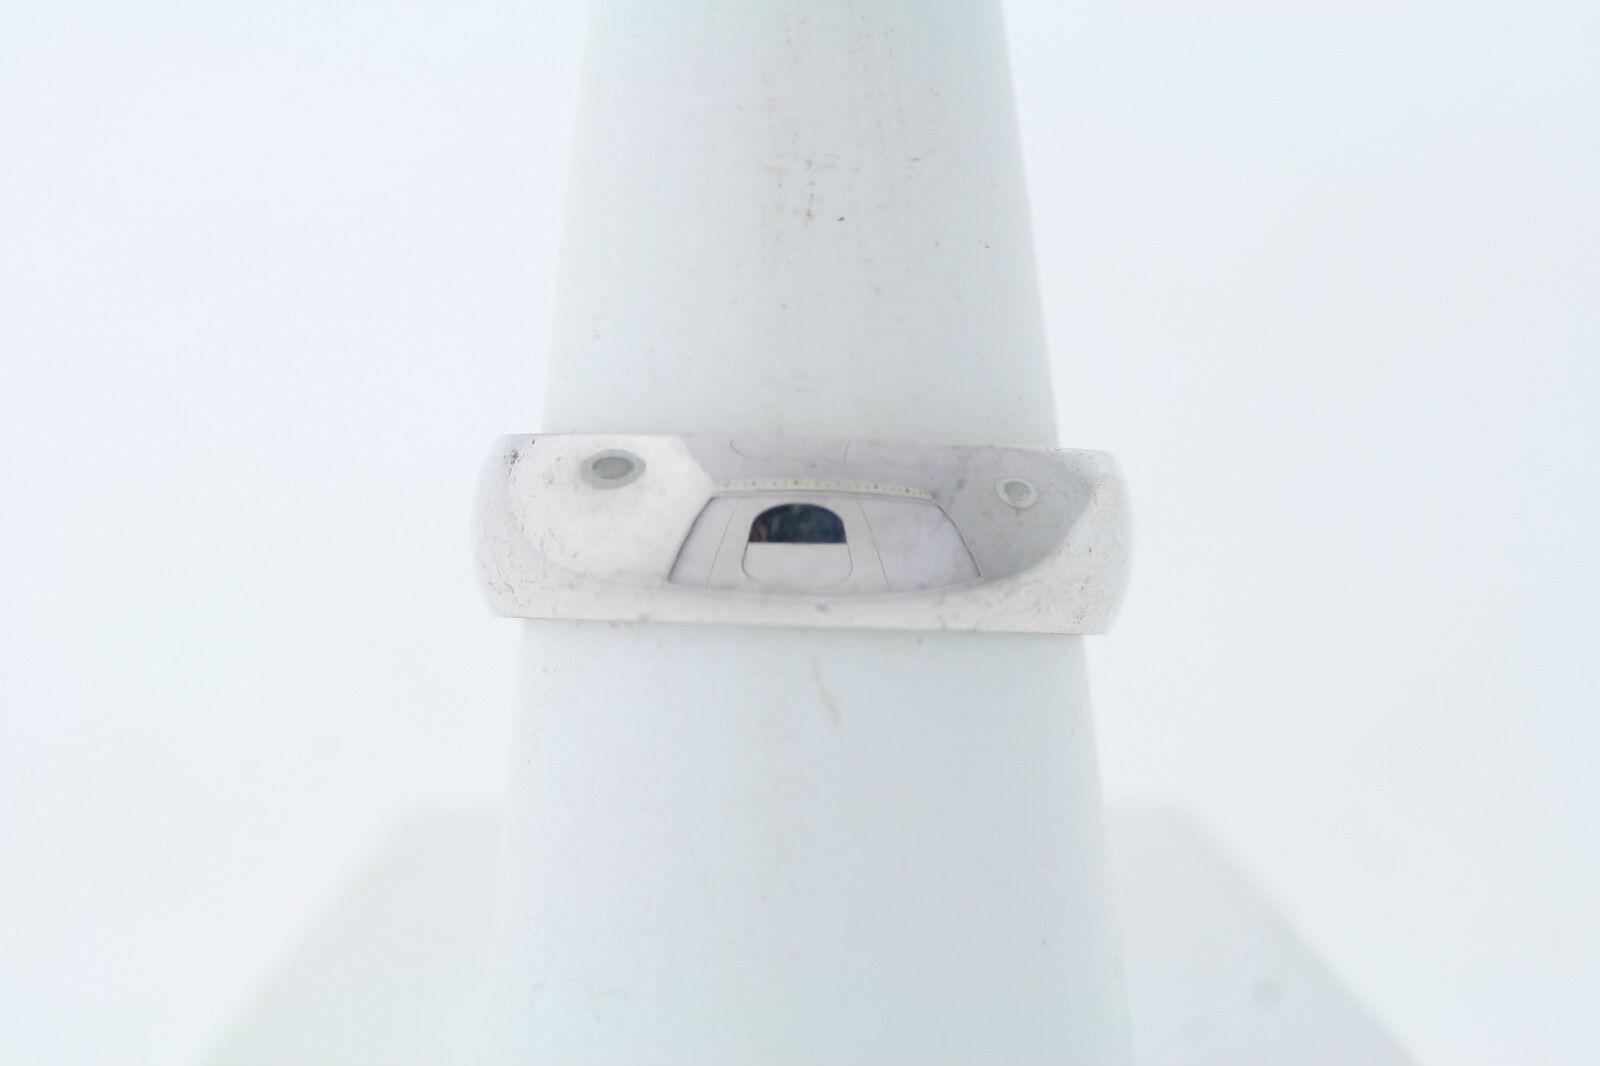 Acciaio Inox Bombato Comodo da Indossare Indossare Indossare Fedina 6mm ad8282